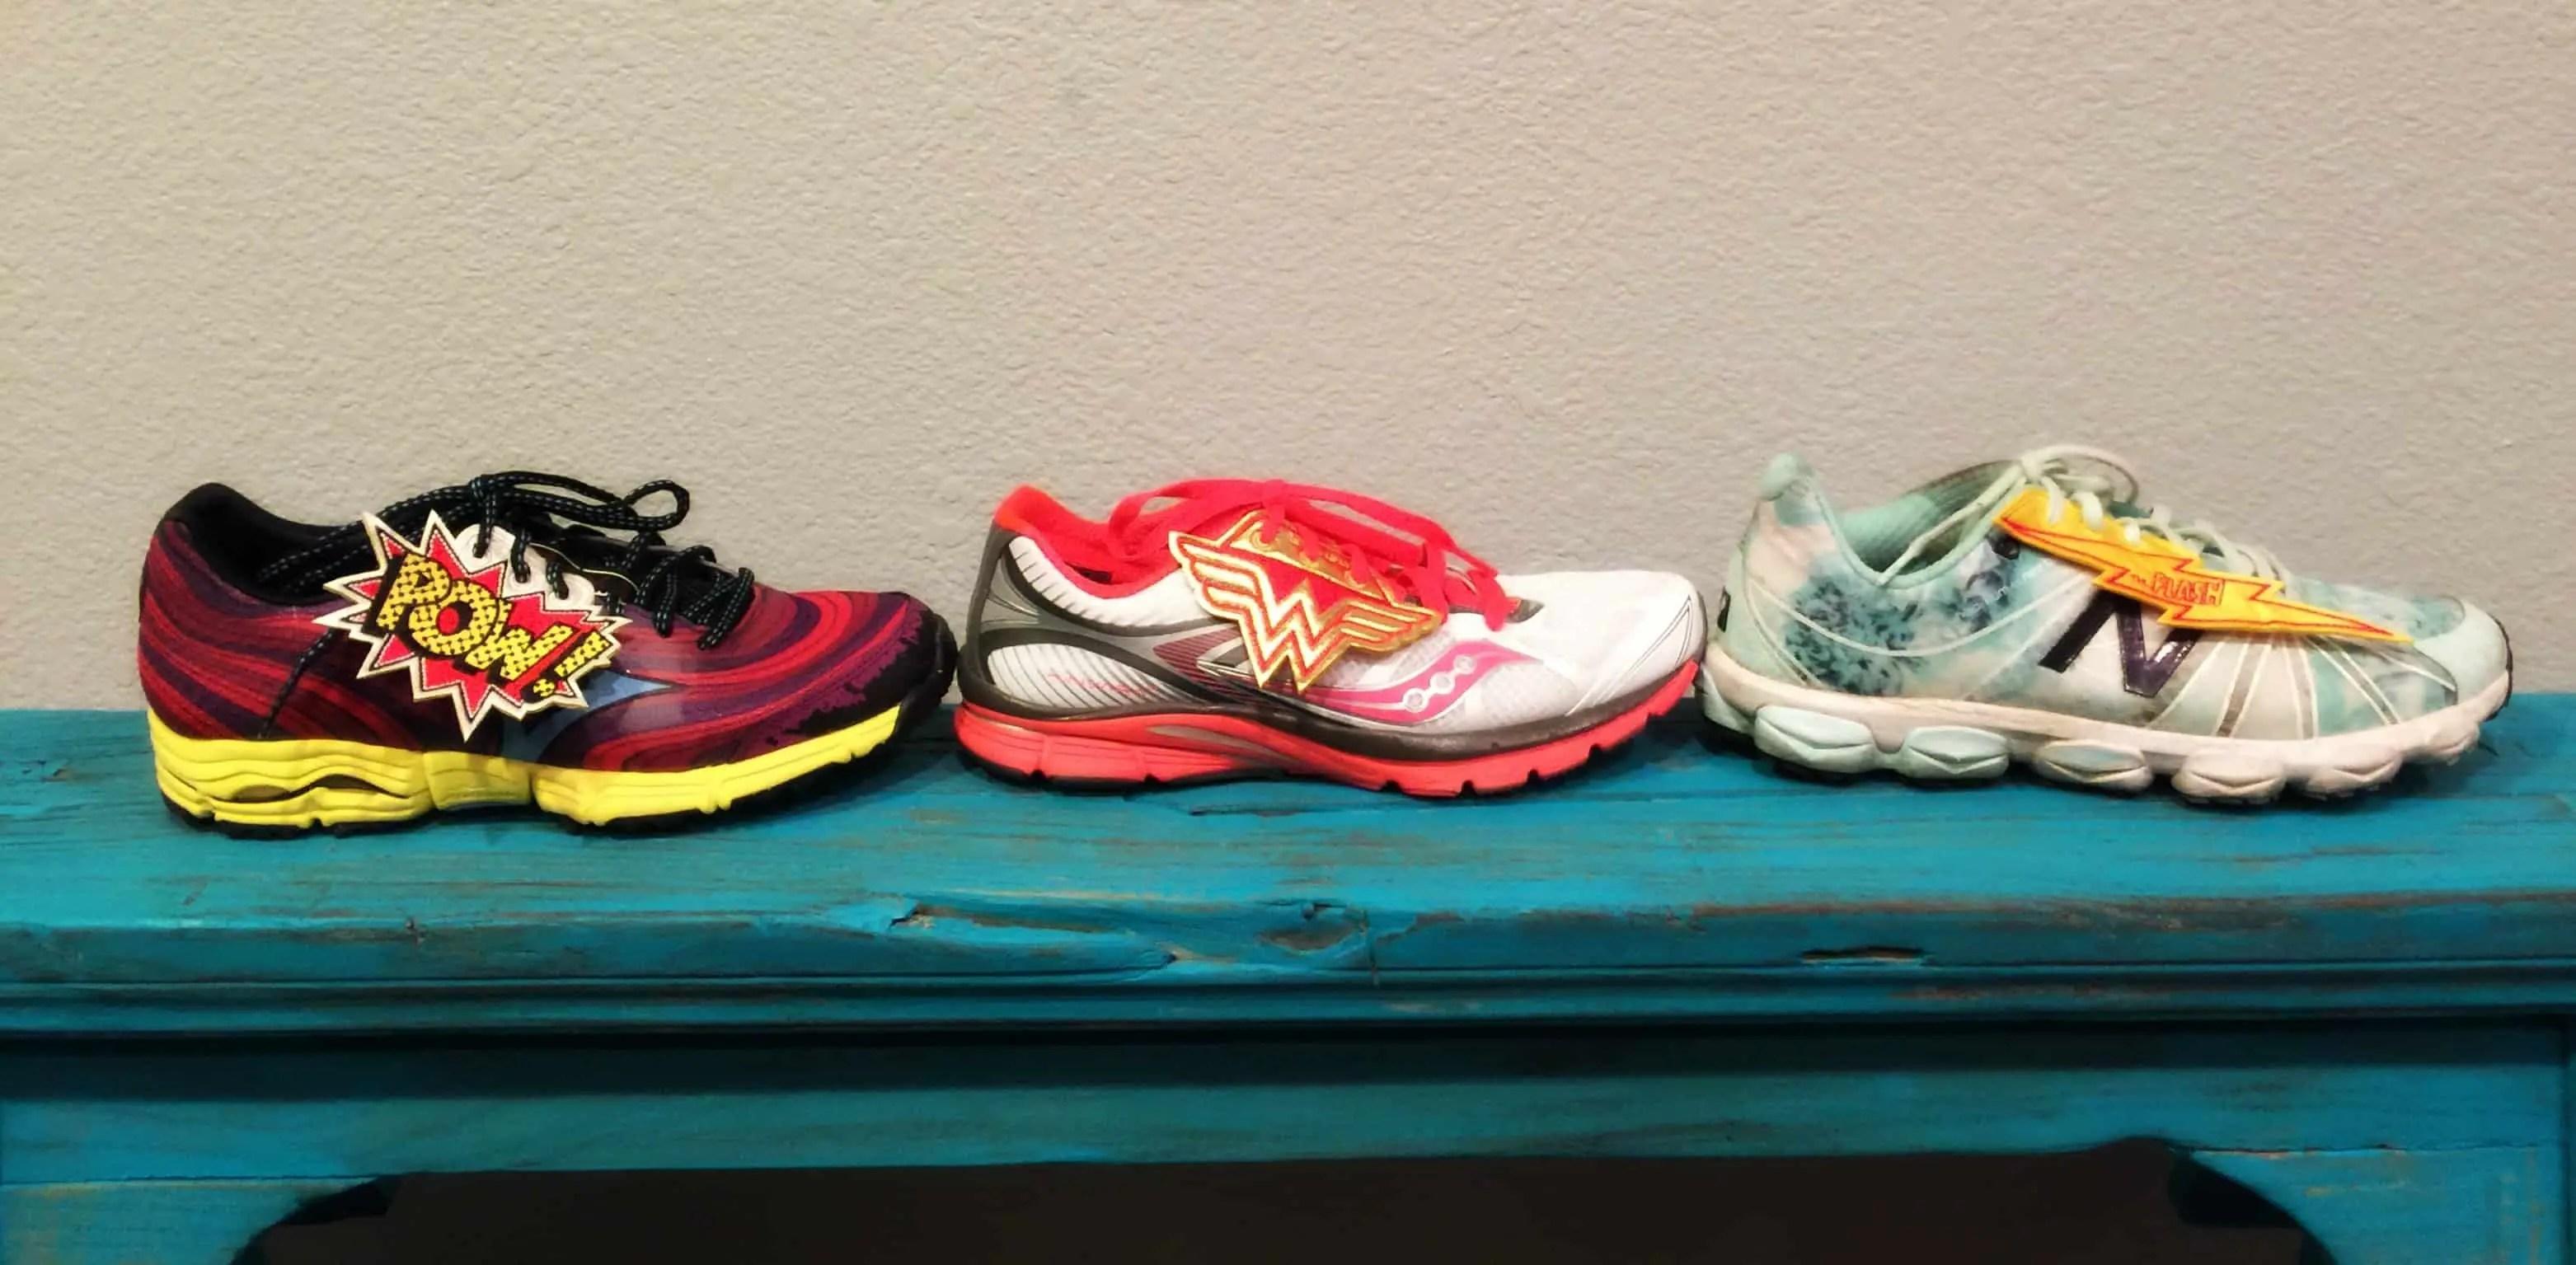 BEX shoe bling